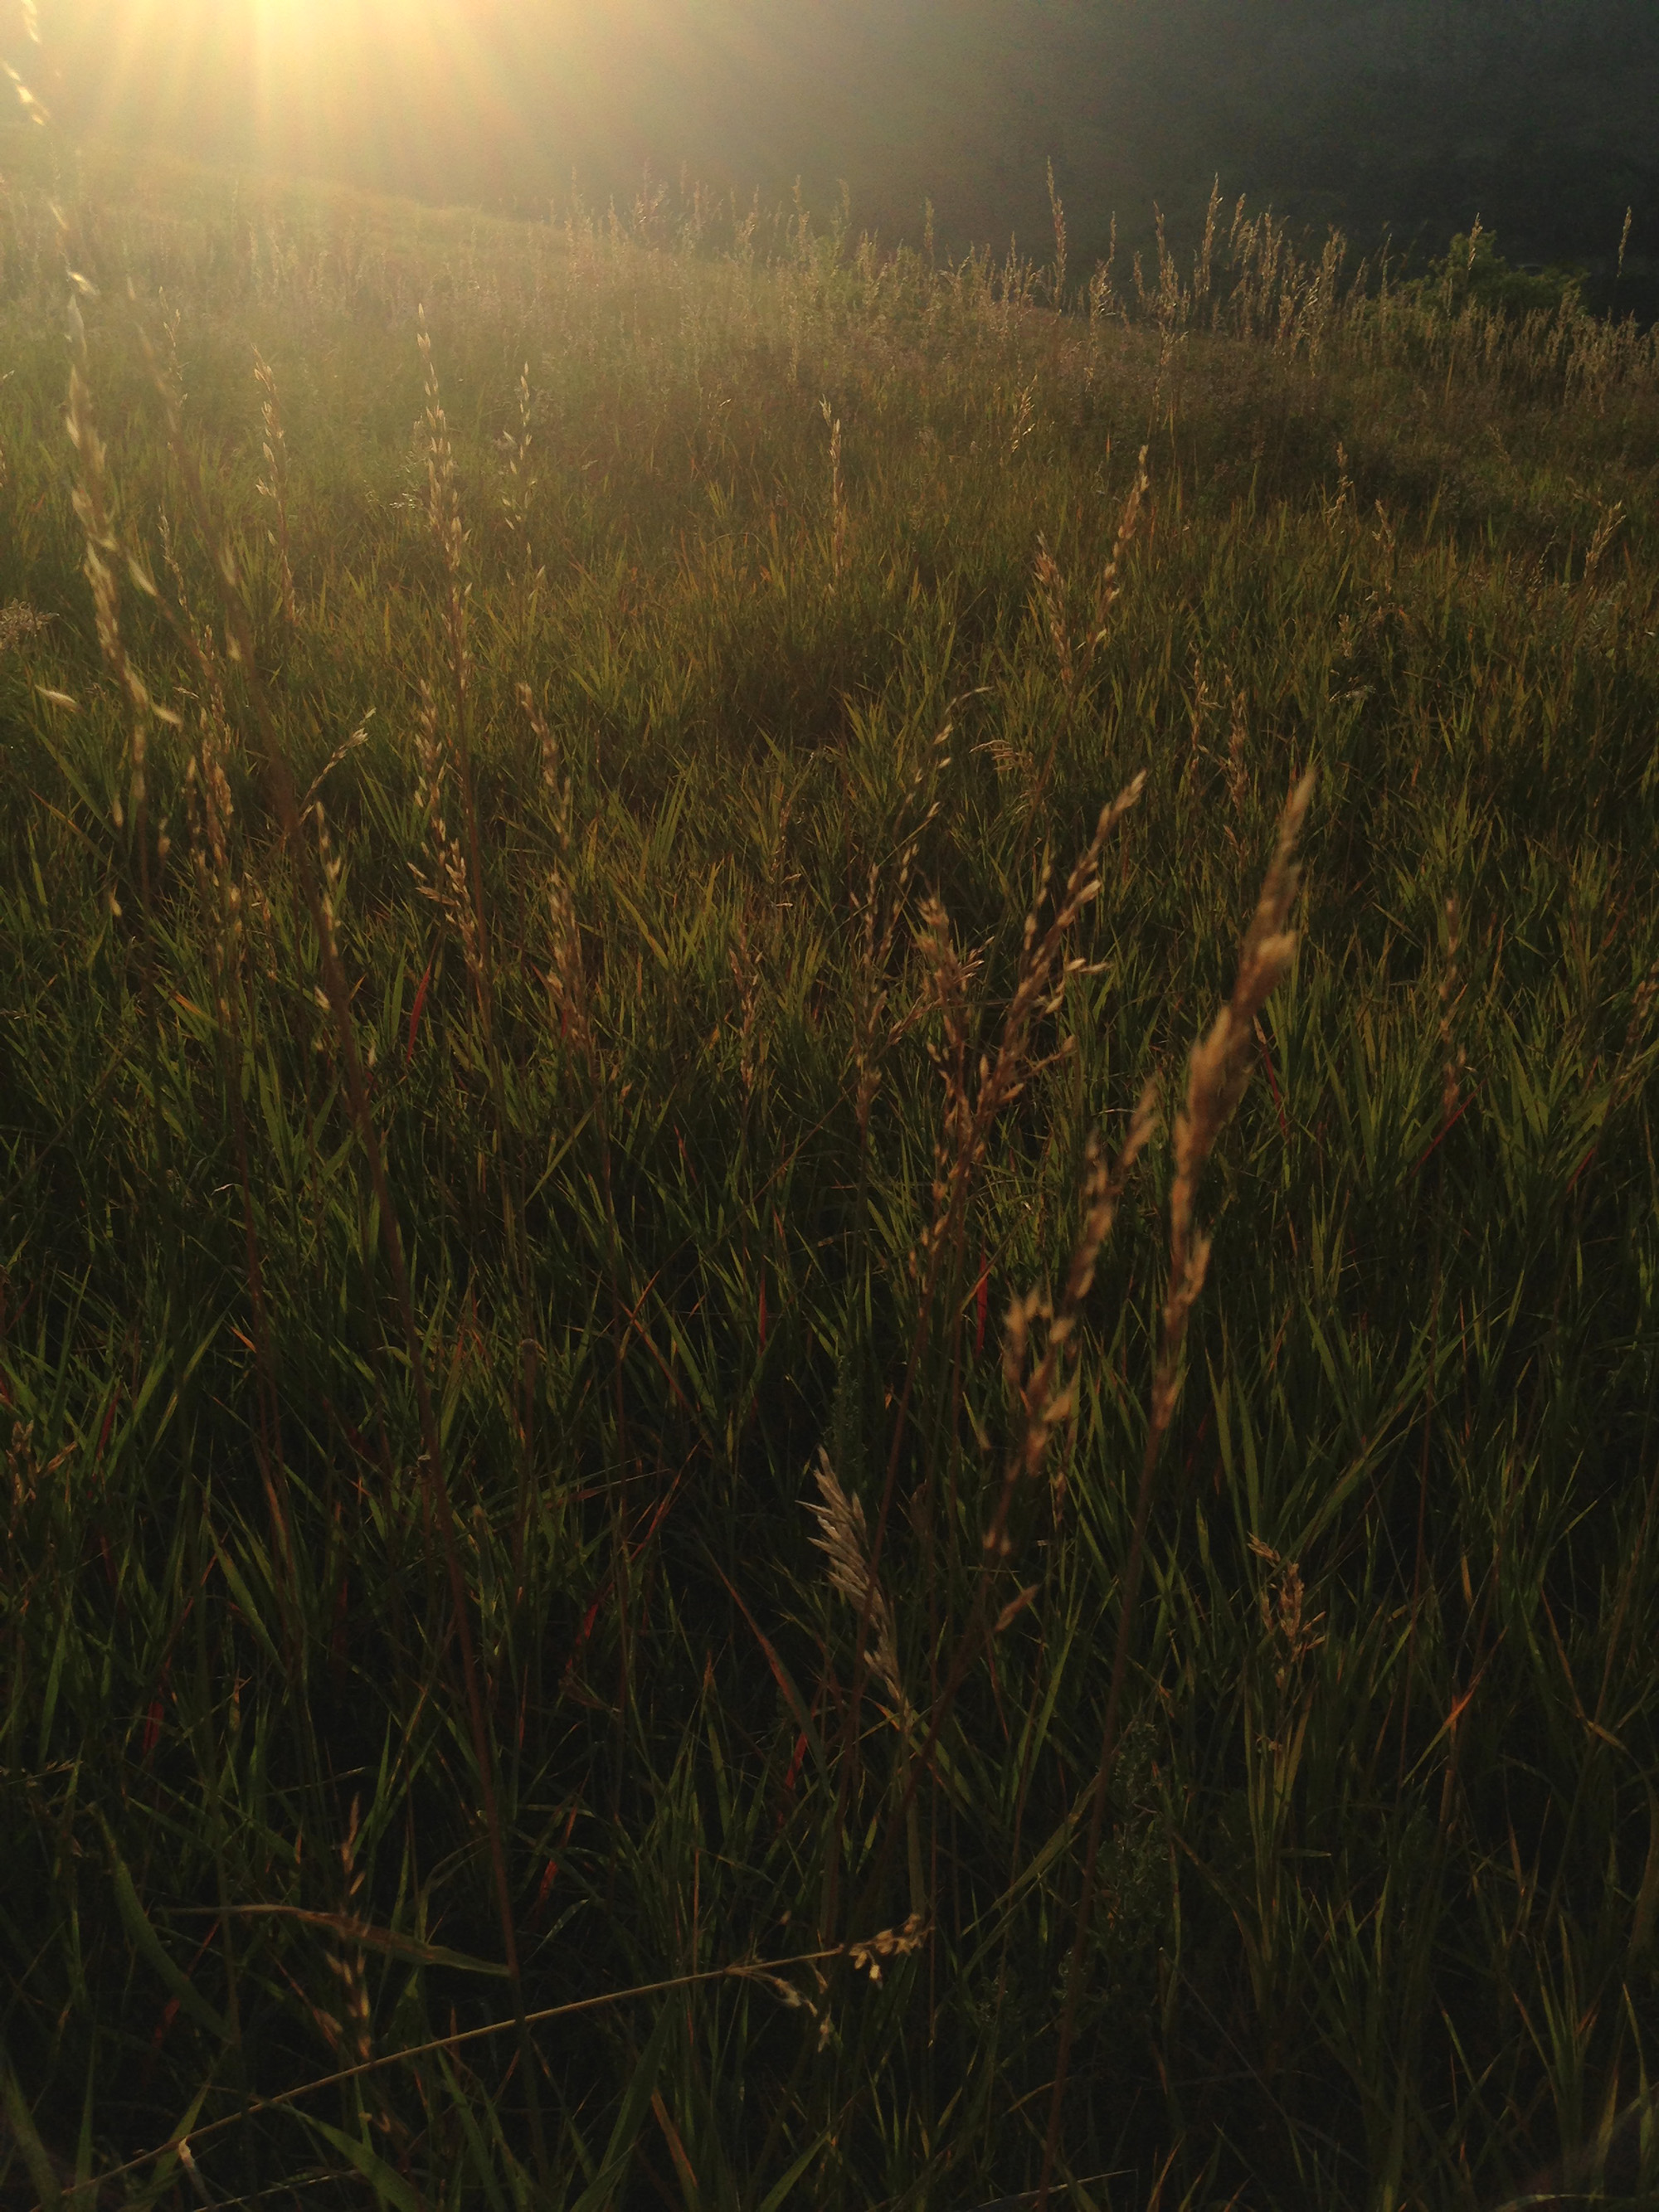 Grasses at the Flatirons, Boulder Colorado